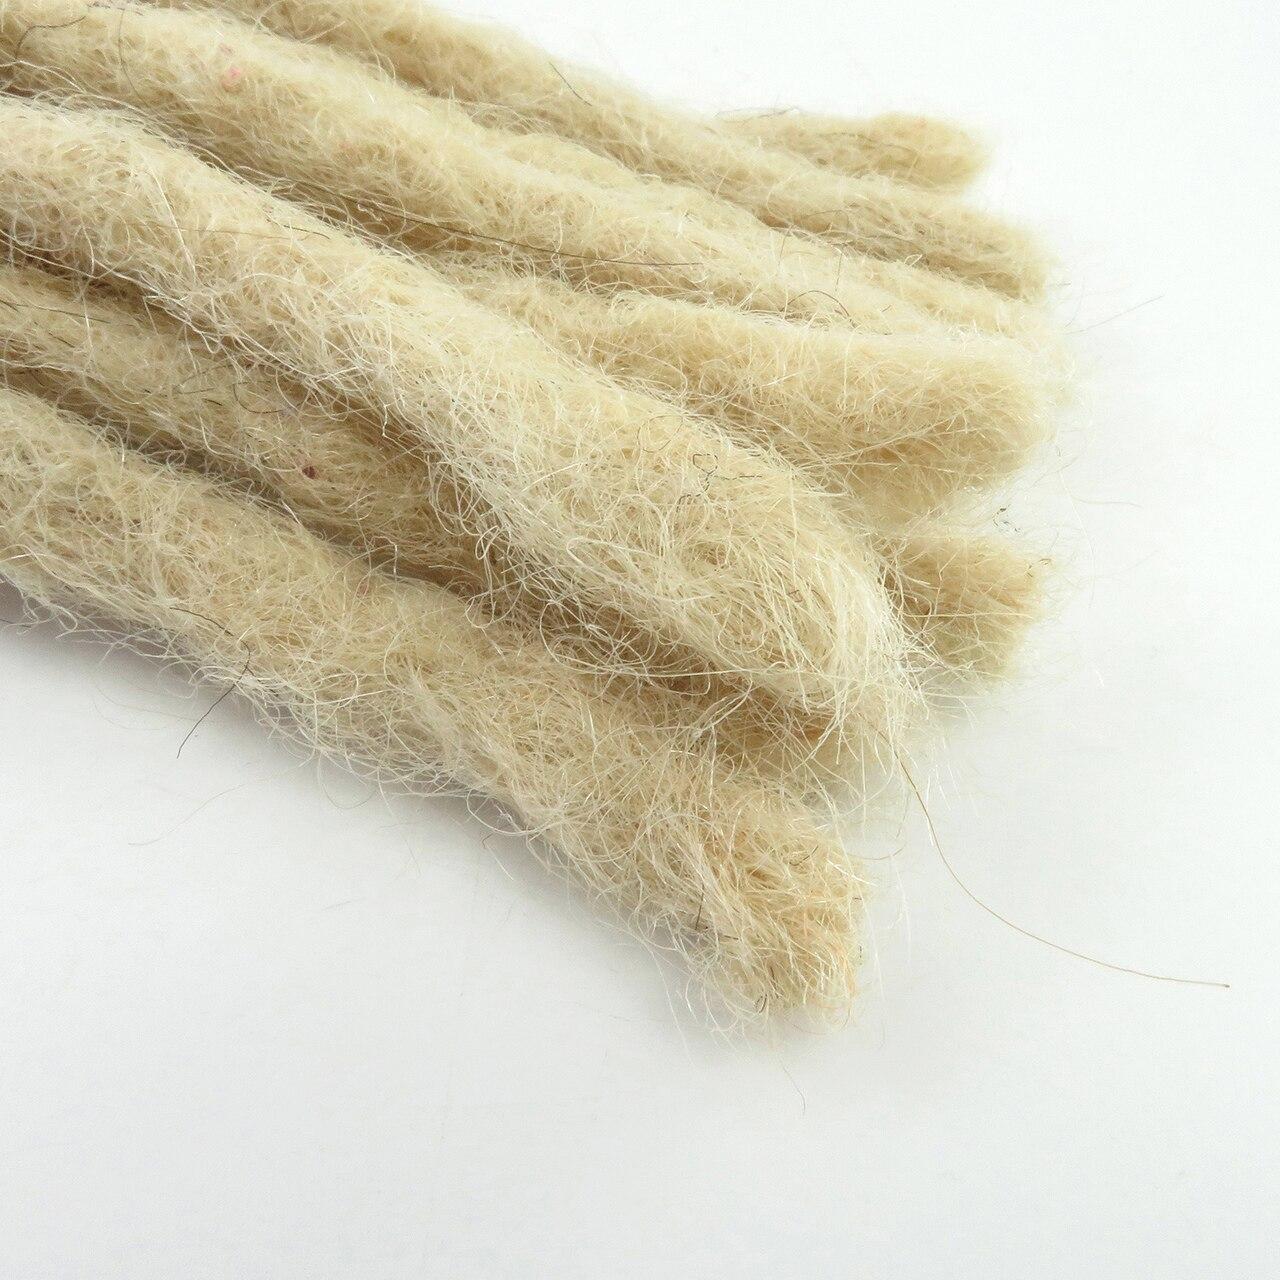 Tight Afro Kinky Bulk Hair 100% Human Hair Dreadlocks Twist Braid Hair Extension 11